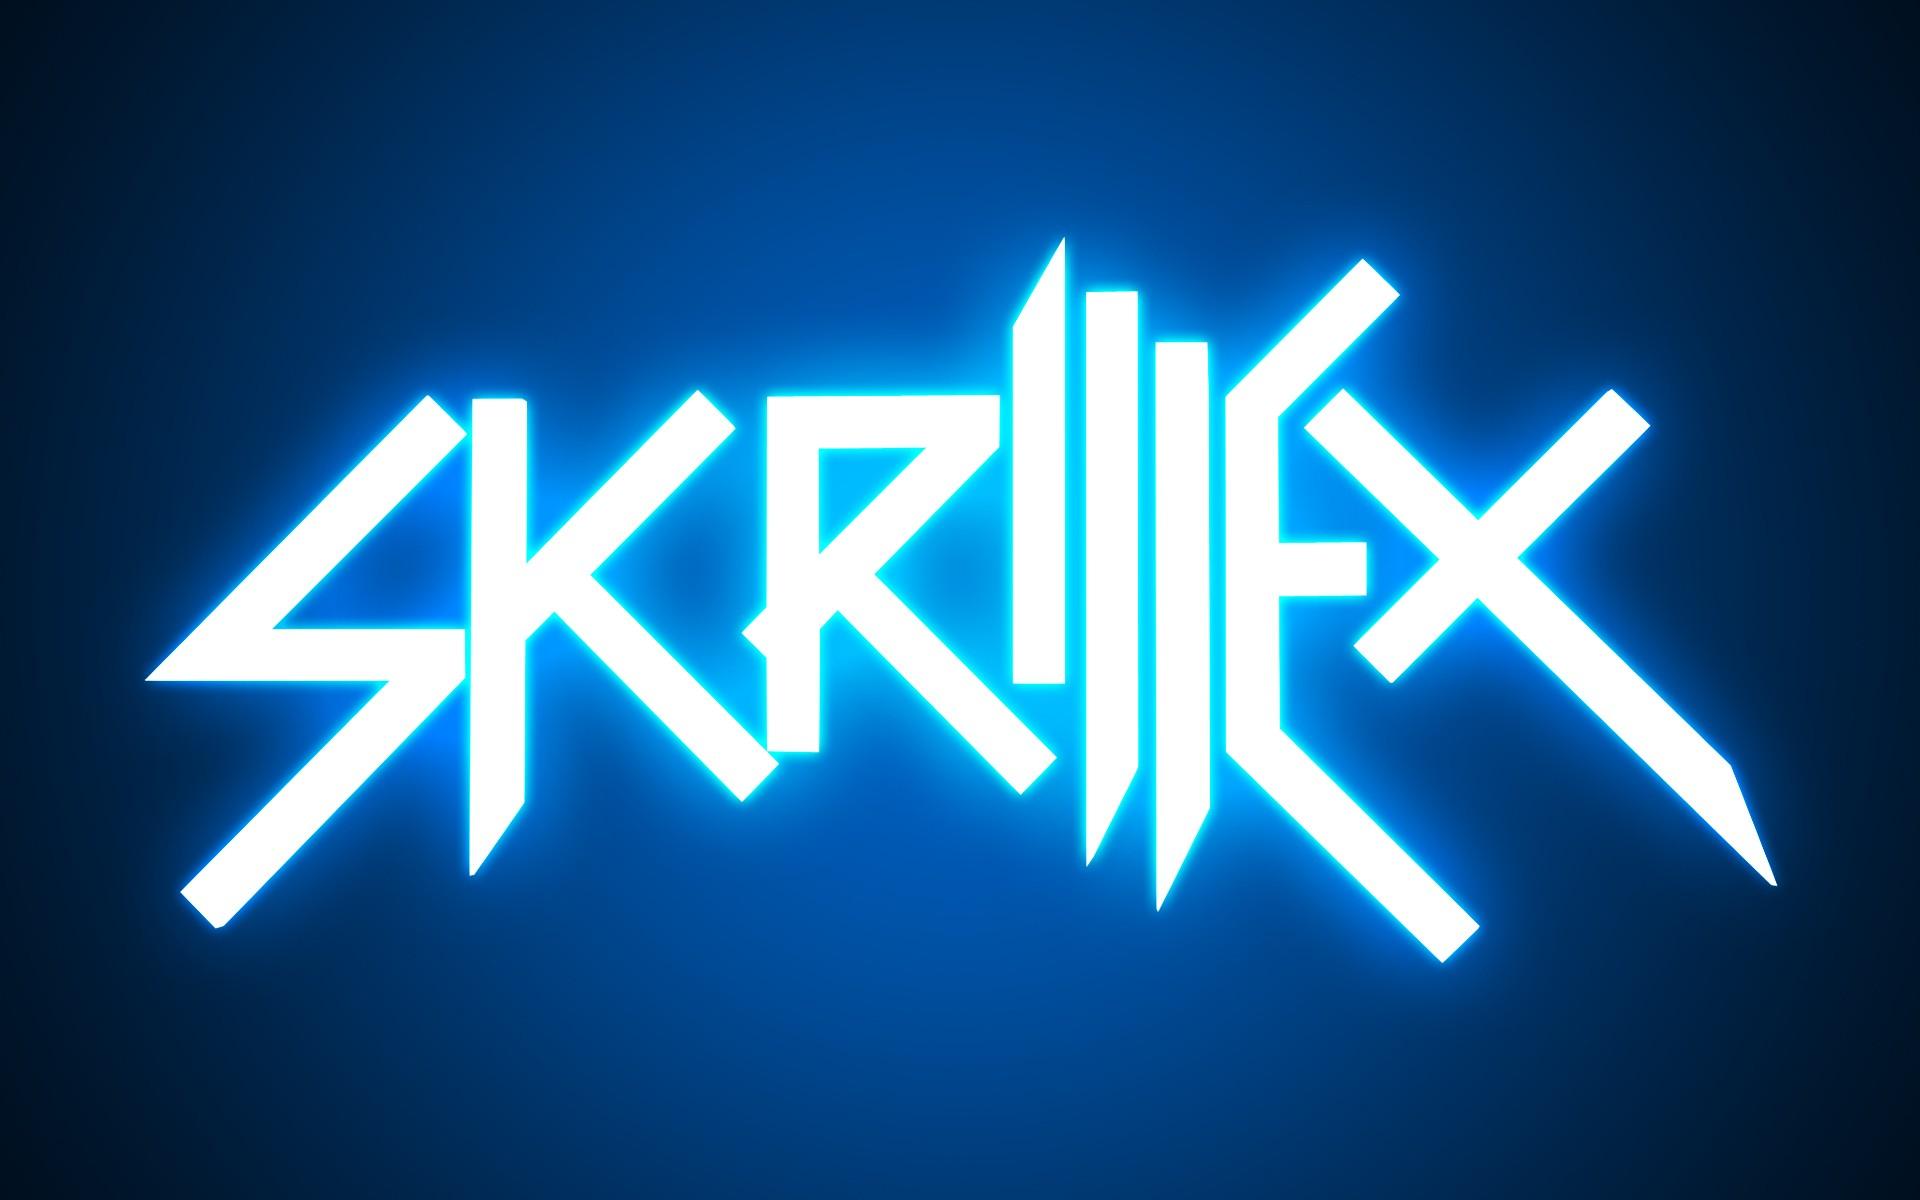 Neon Skrillex Wallpaper 46661